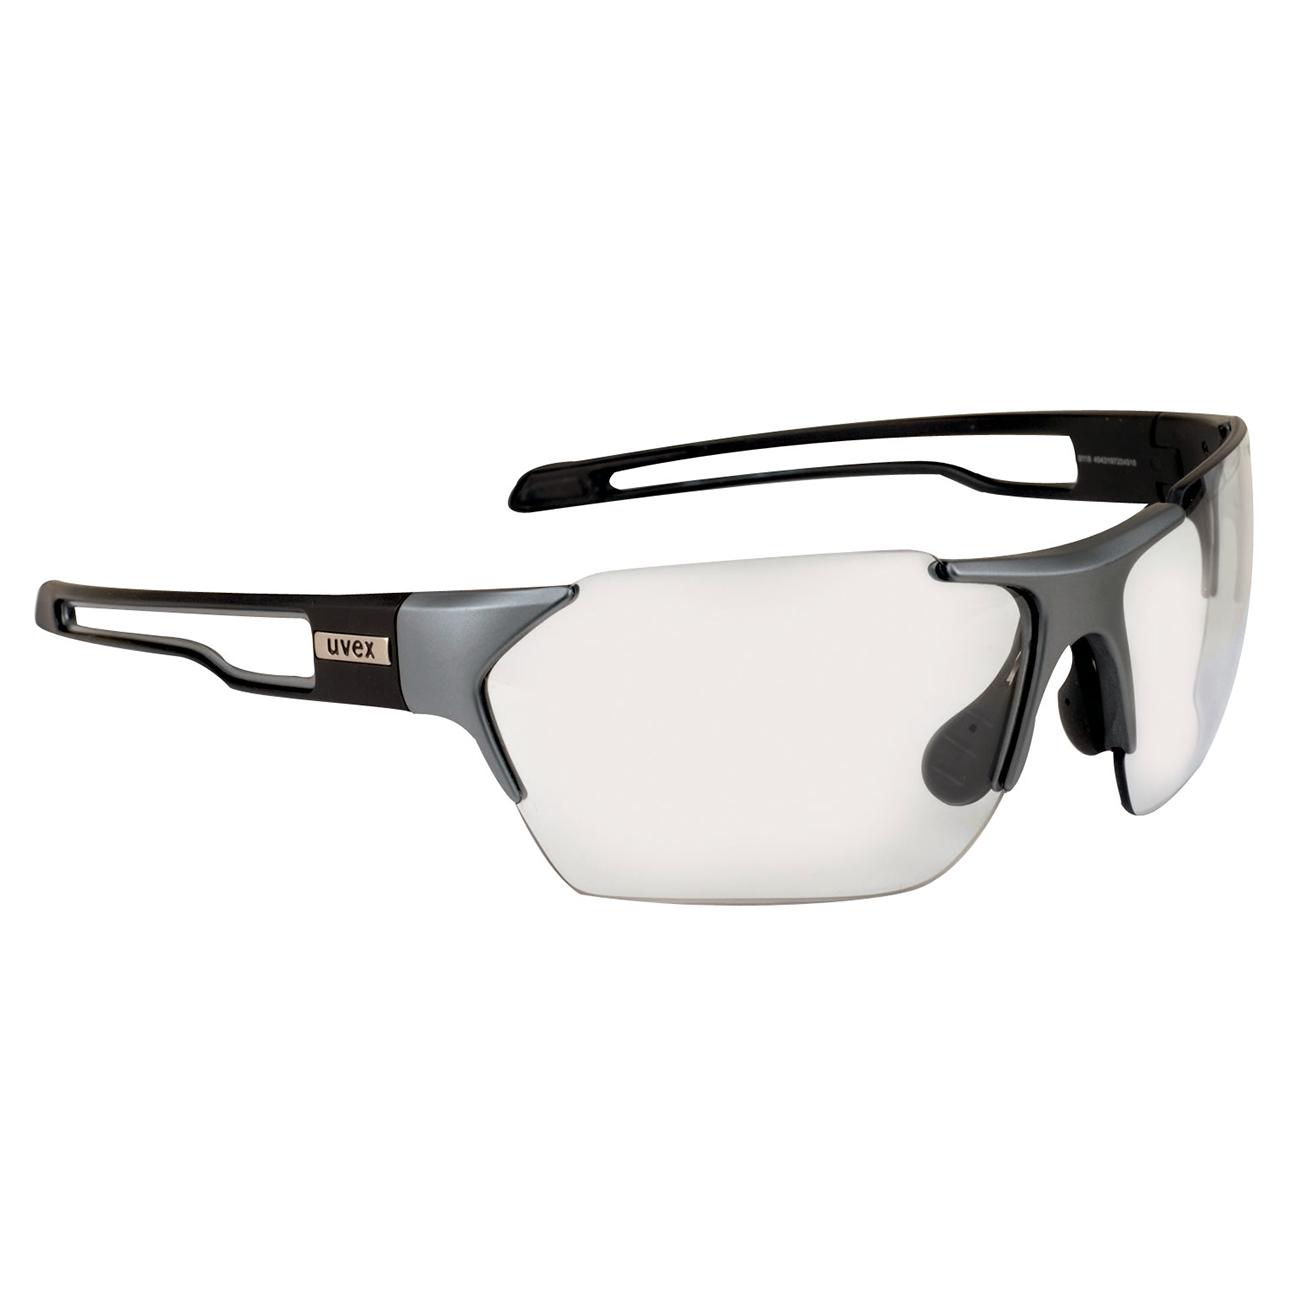 Designapplause Uvex Sgl 202 Vario Cycling Glasses